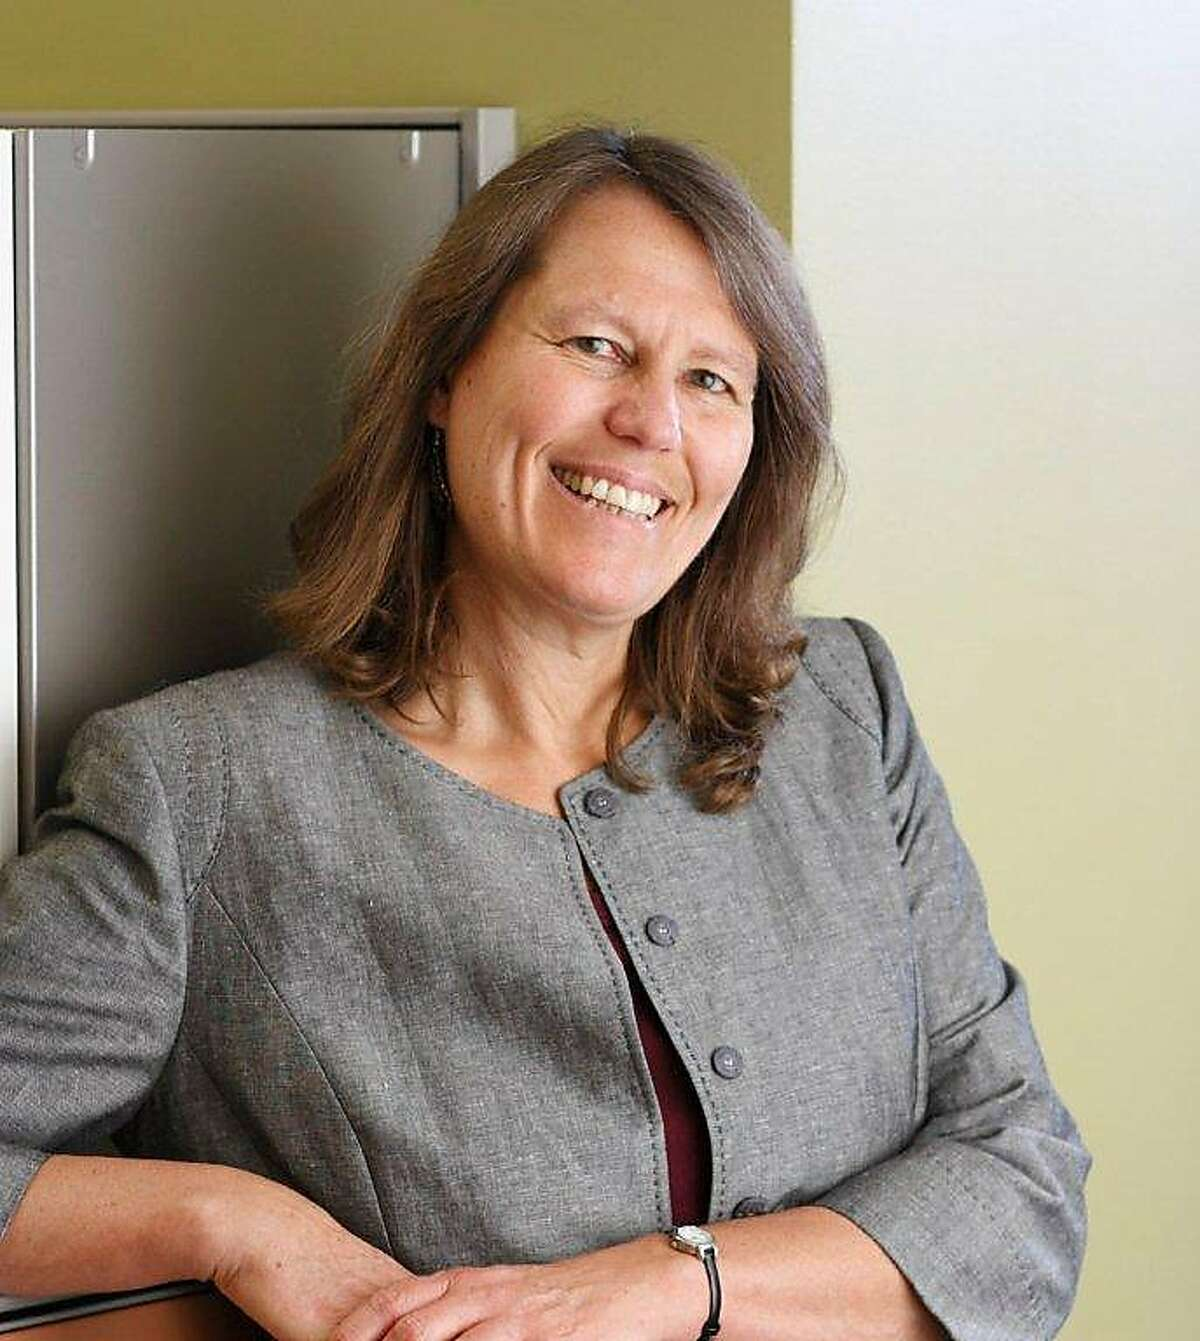 Polly Marshall. Former member of San Francisco Rent Board